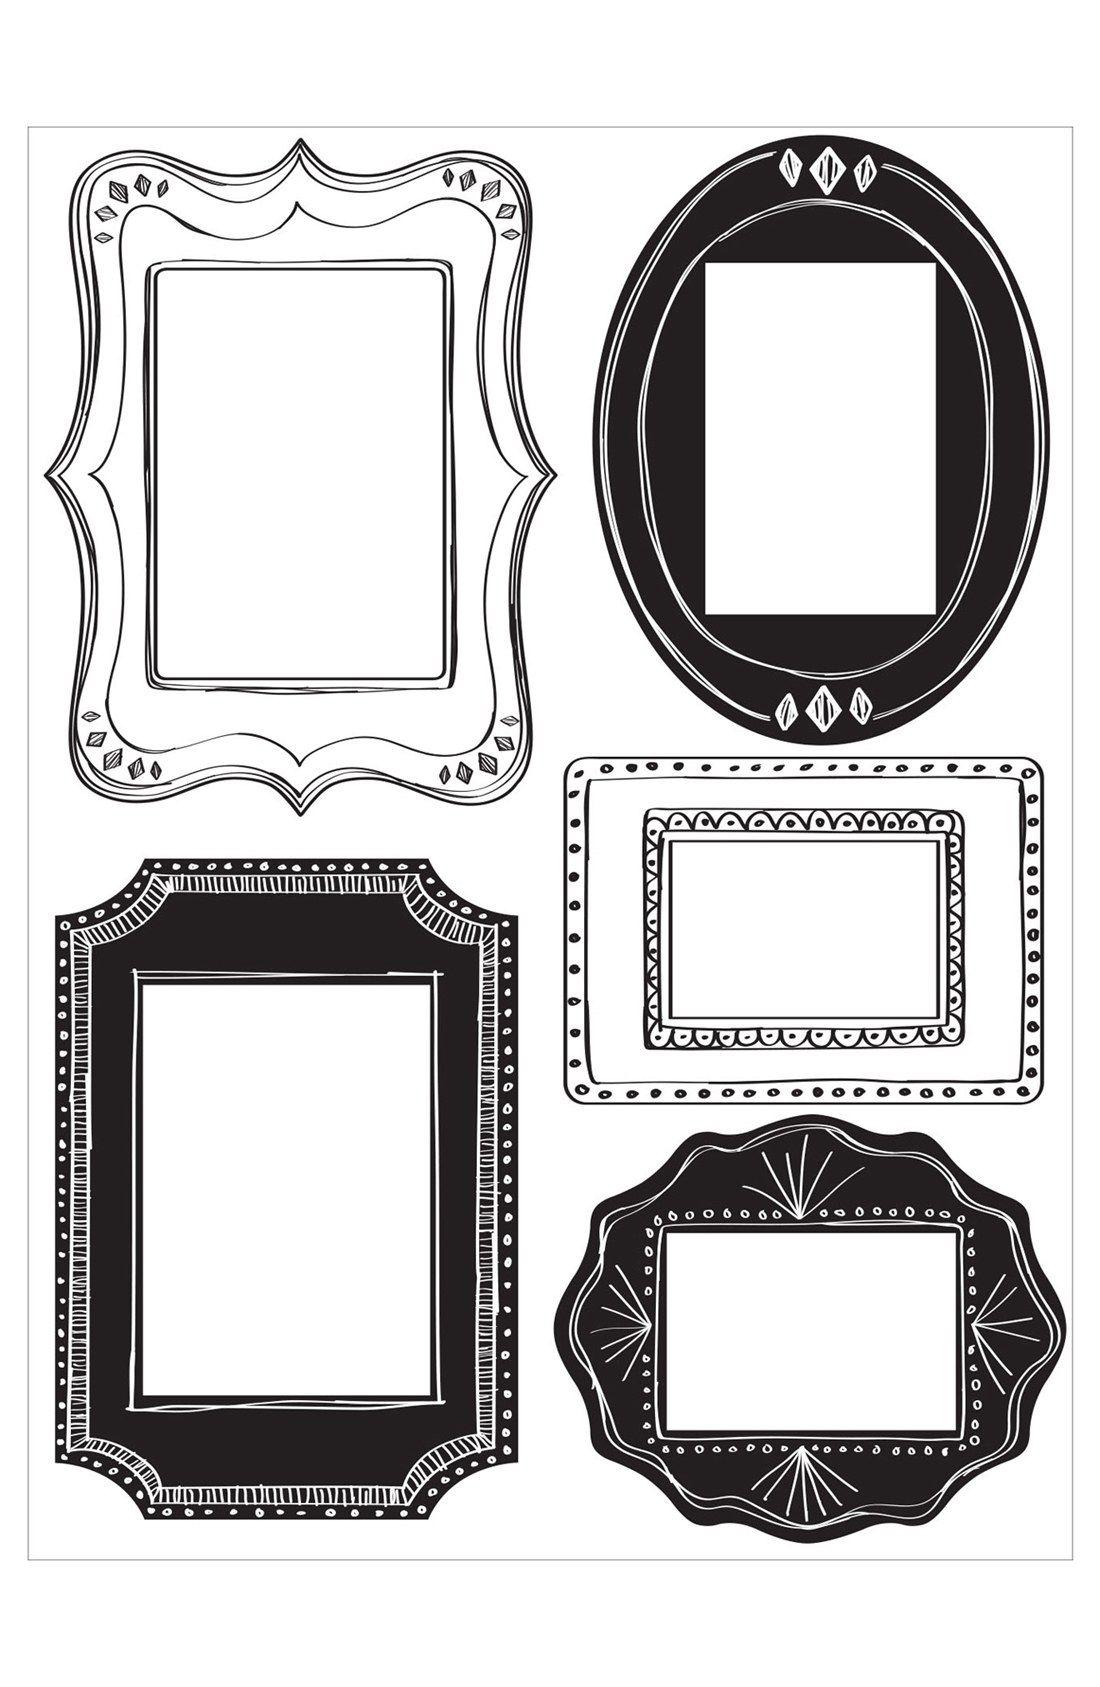 Wallpops \'Sketch It\' Wall Decal Frames (Set of 5) | vintage old ...